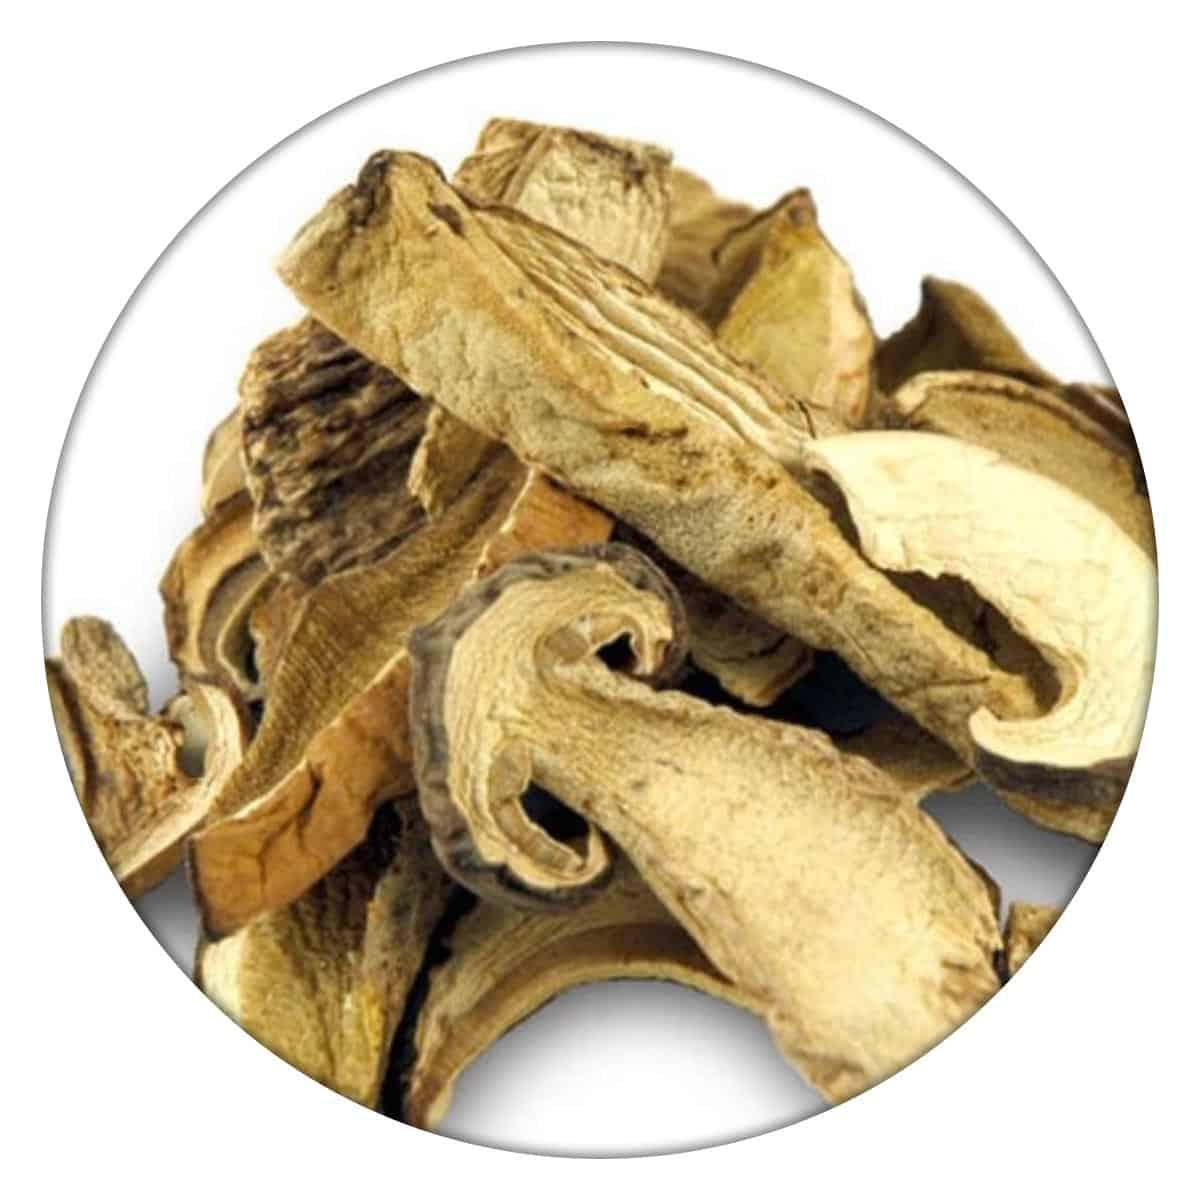 Buy IAG Foods Dried Porcini Mushrooms - 20 gm